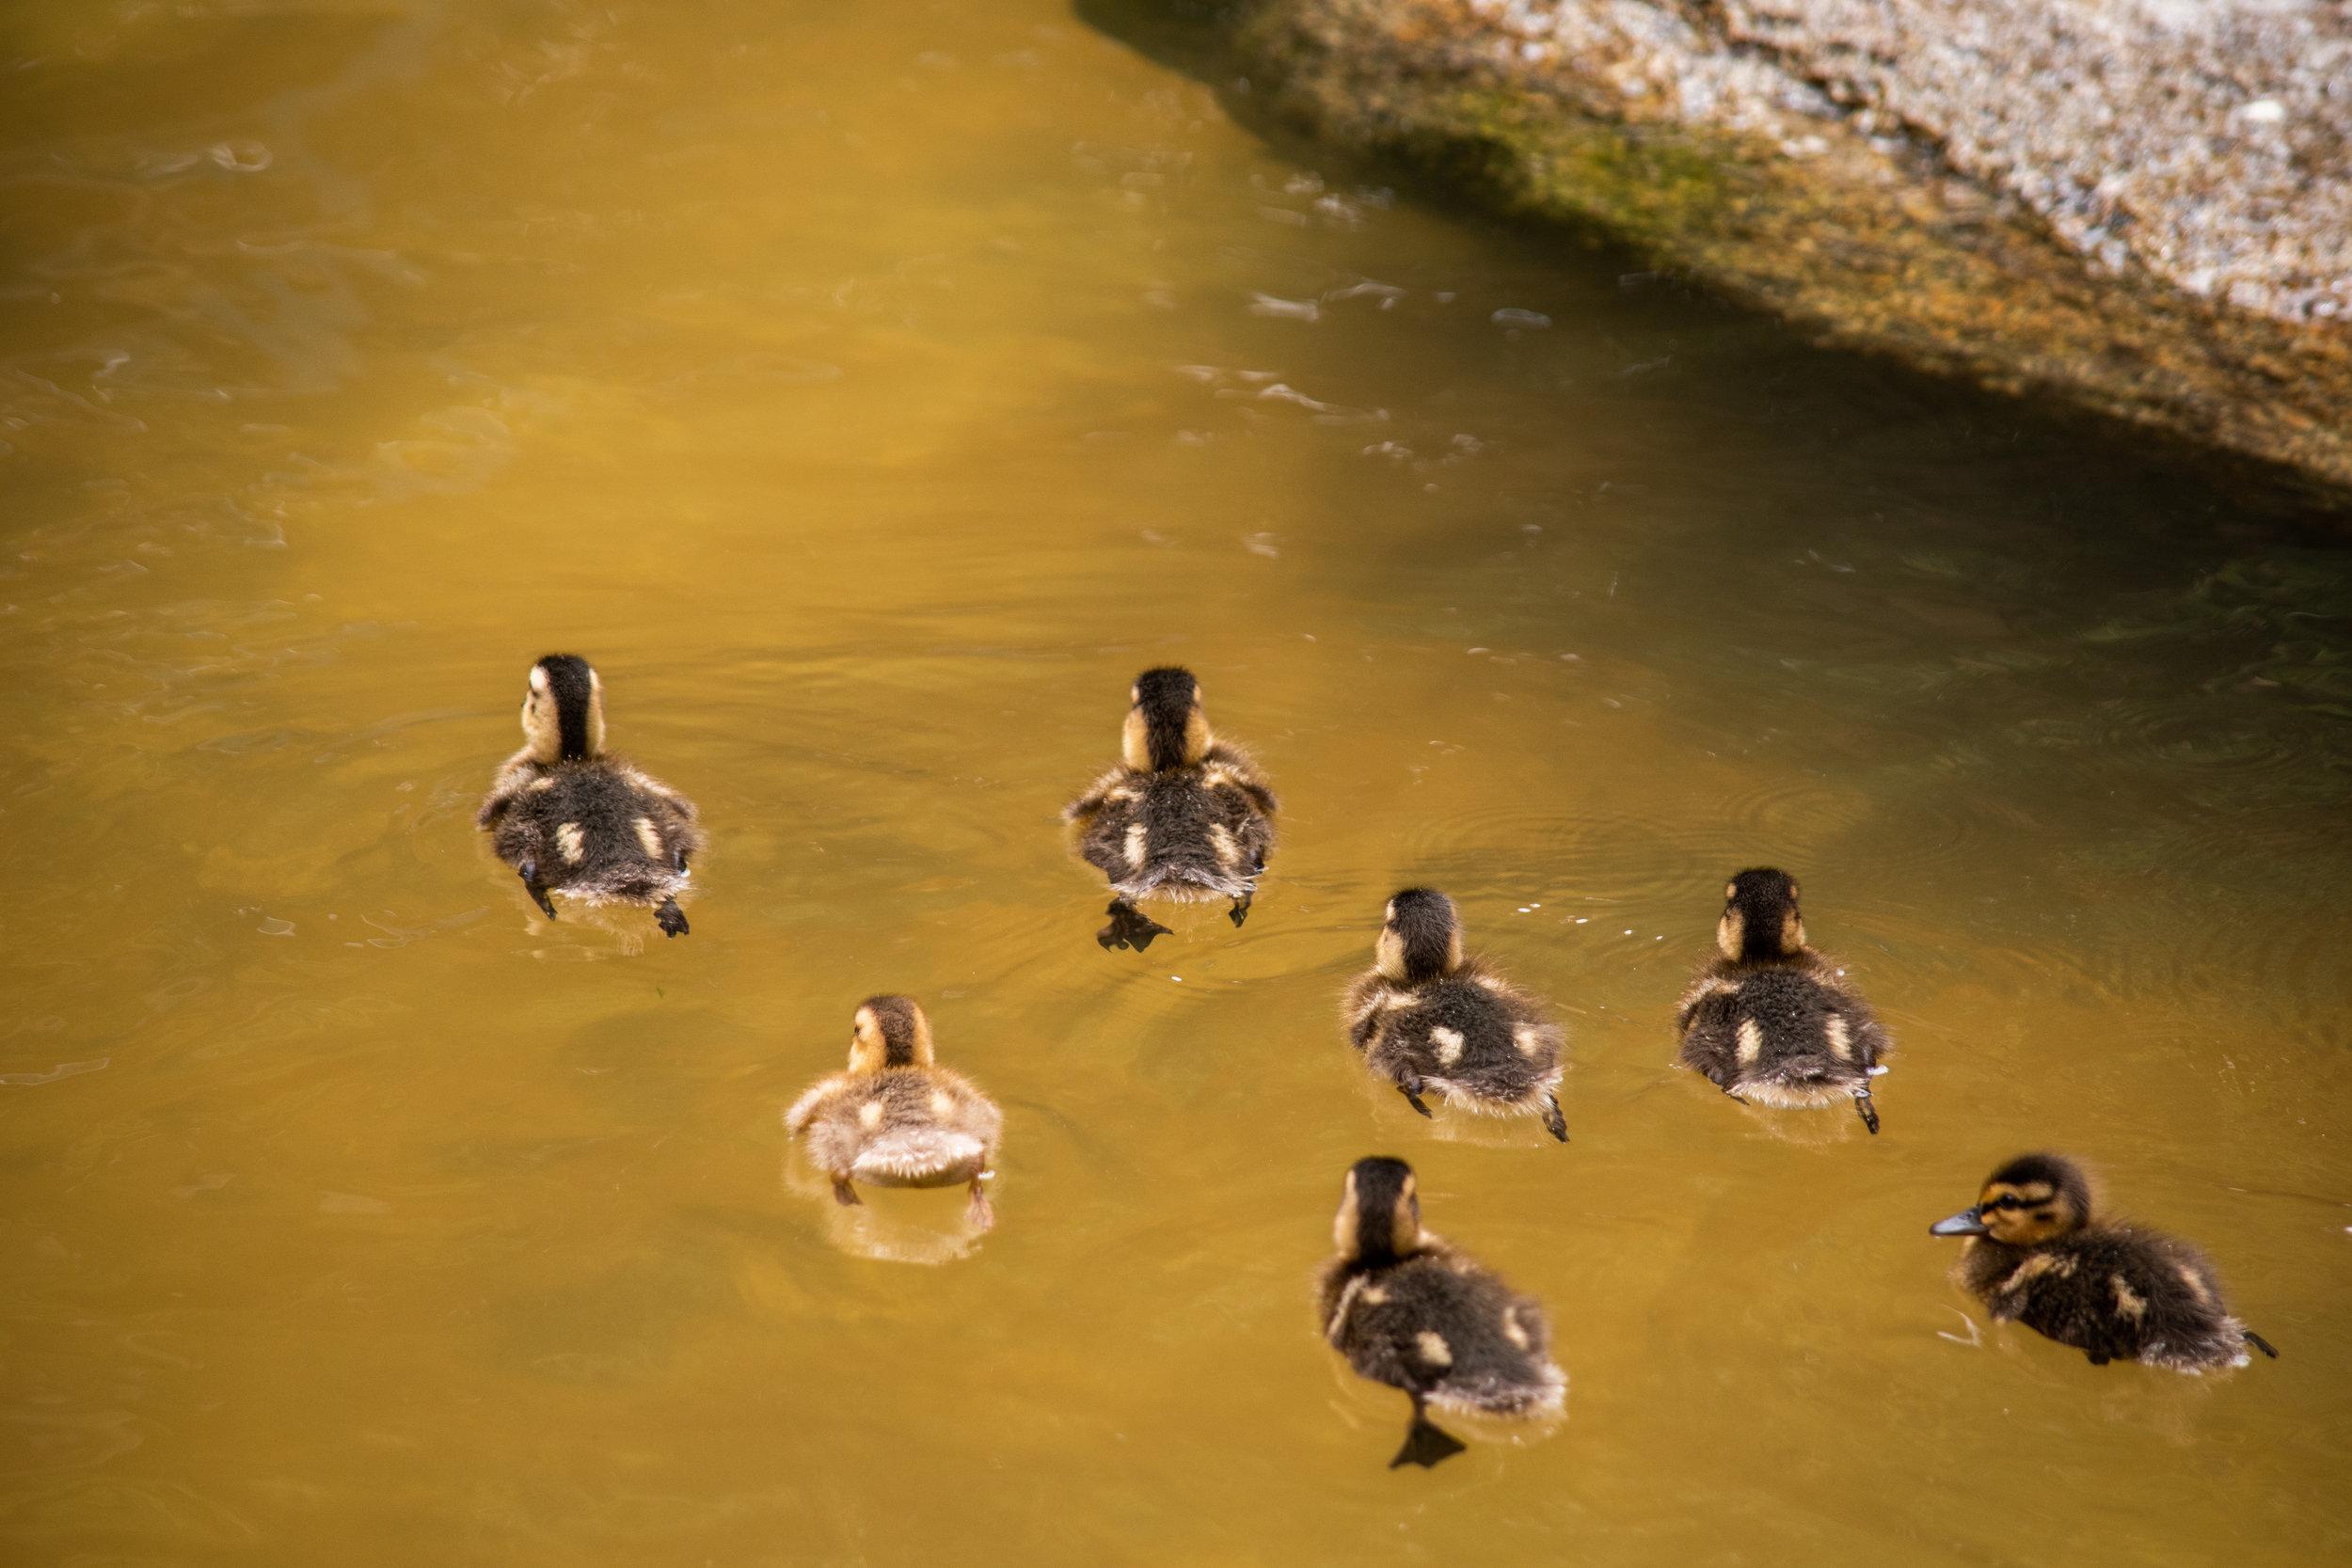 zoo 41 - duck squad.jpg